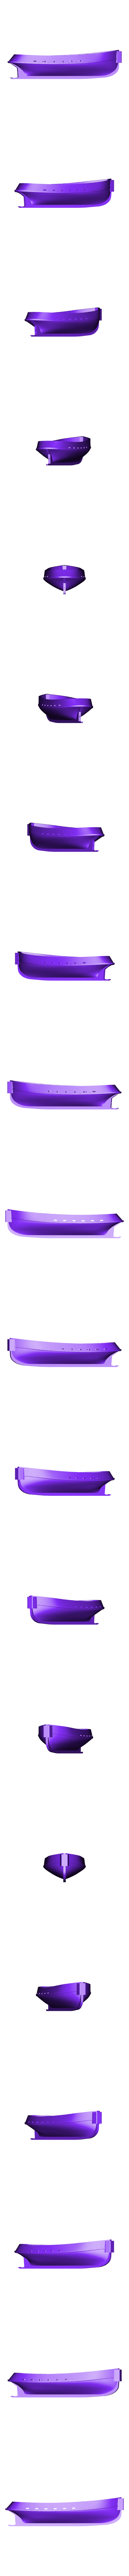 tug_hull.stl Download free STL file Barge with Tugboat • 3D print object, Kajdalon